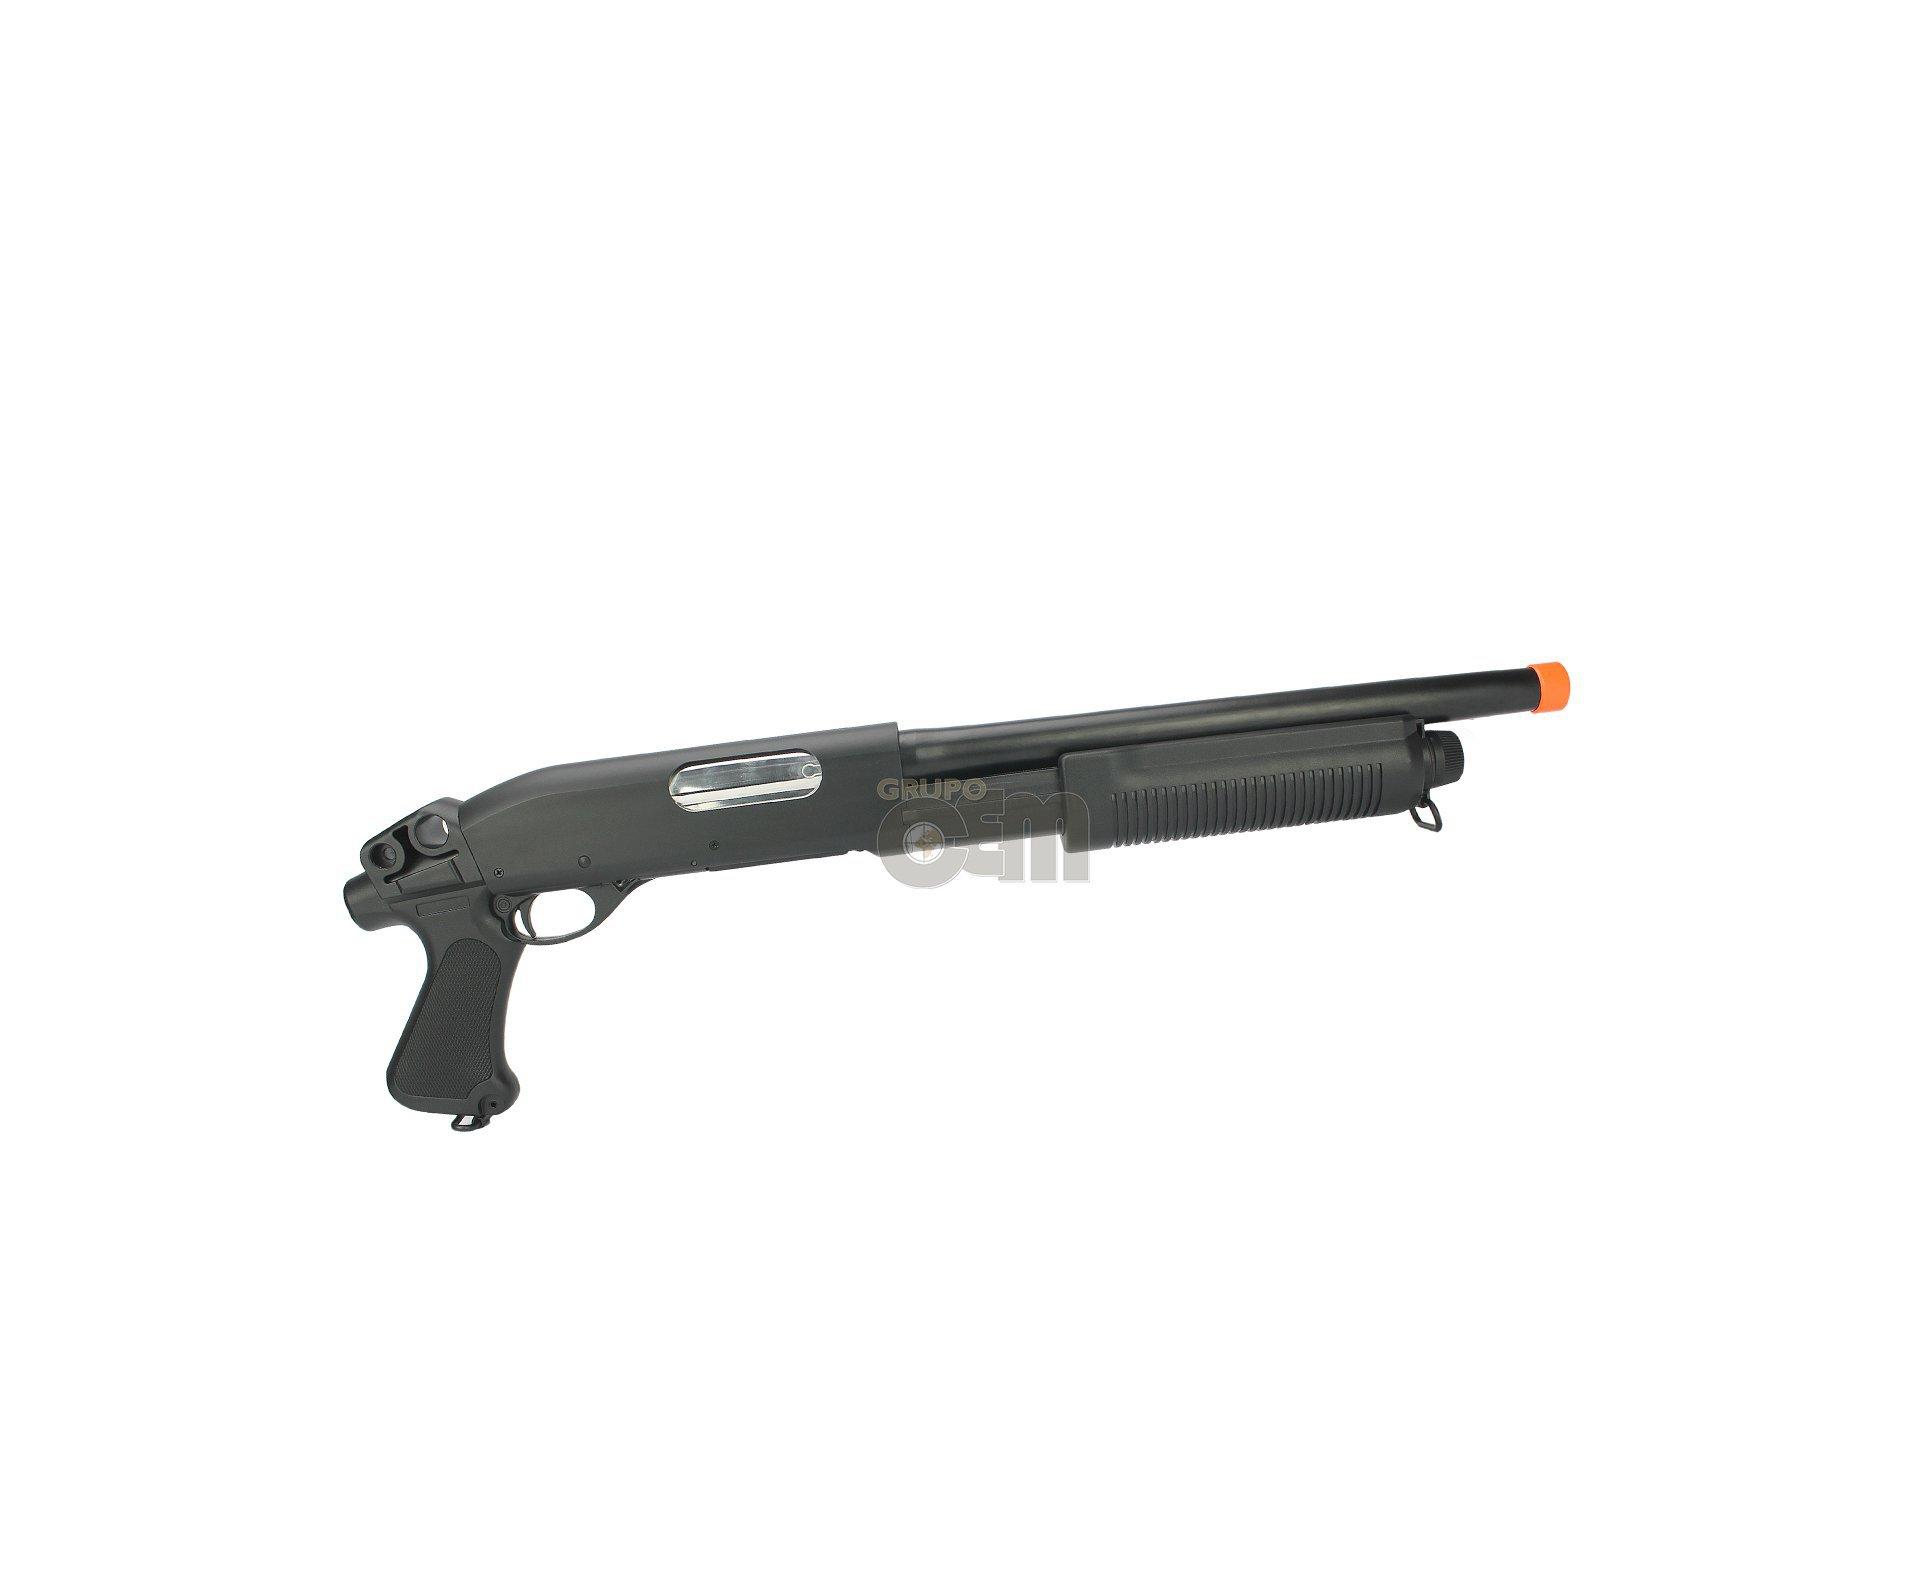 Shotgun / Escopeta De Airsoft Shotgun M870 Pistol Grip Cal 6,0 Mm - Cm351 - Cyma